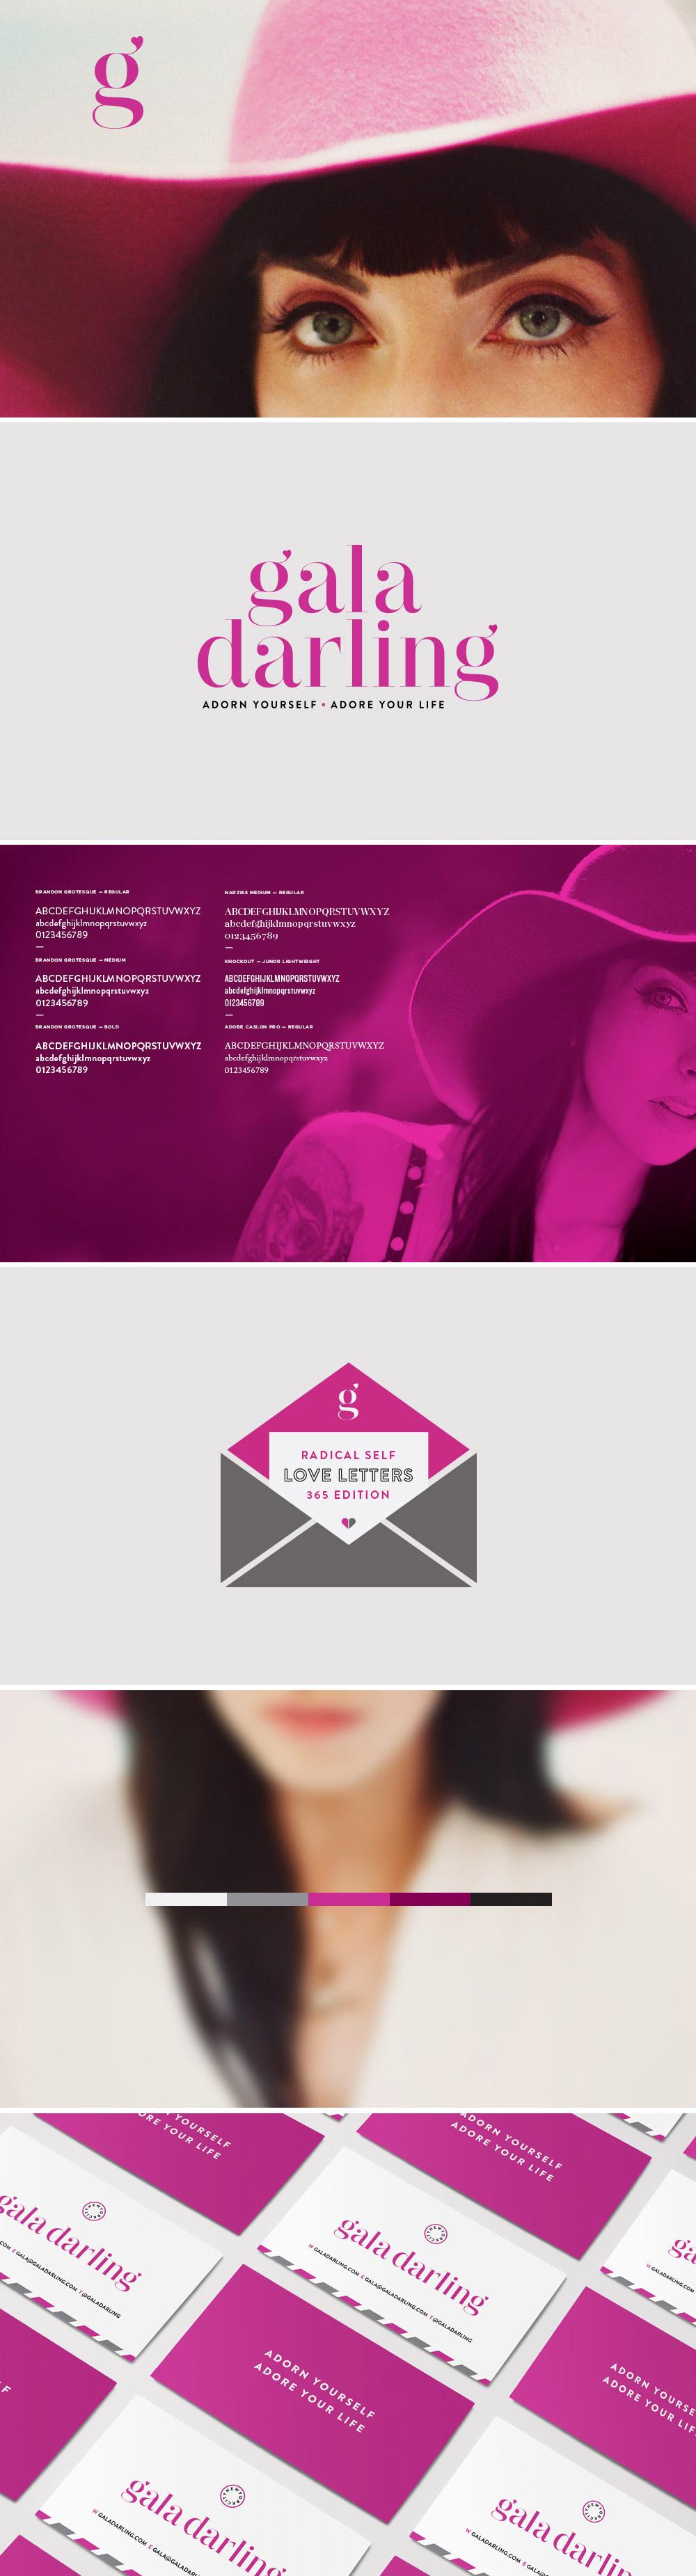 Branch | Gala Darling Branding and Website